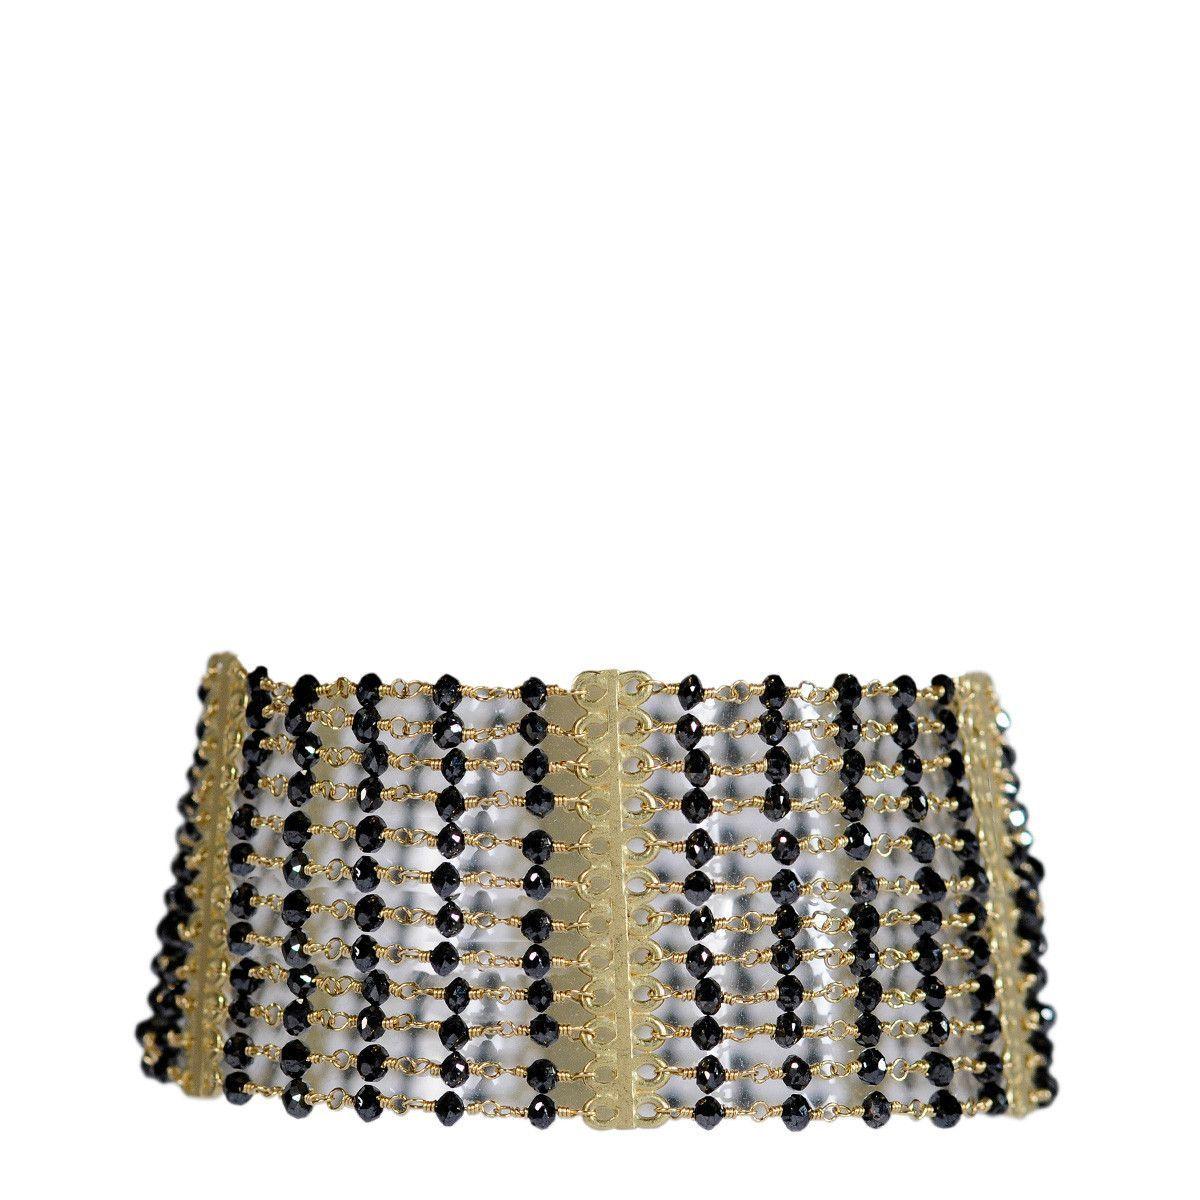 18K Gold 12 Strand Black Diamond Bracelet